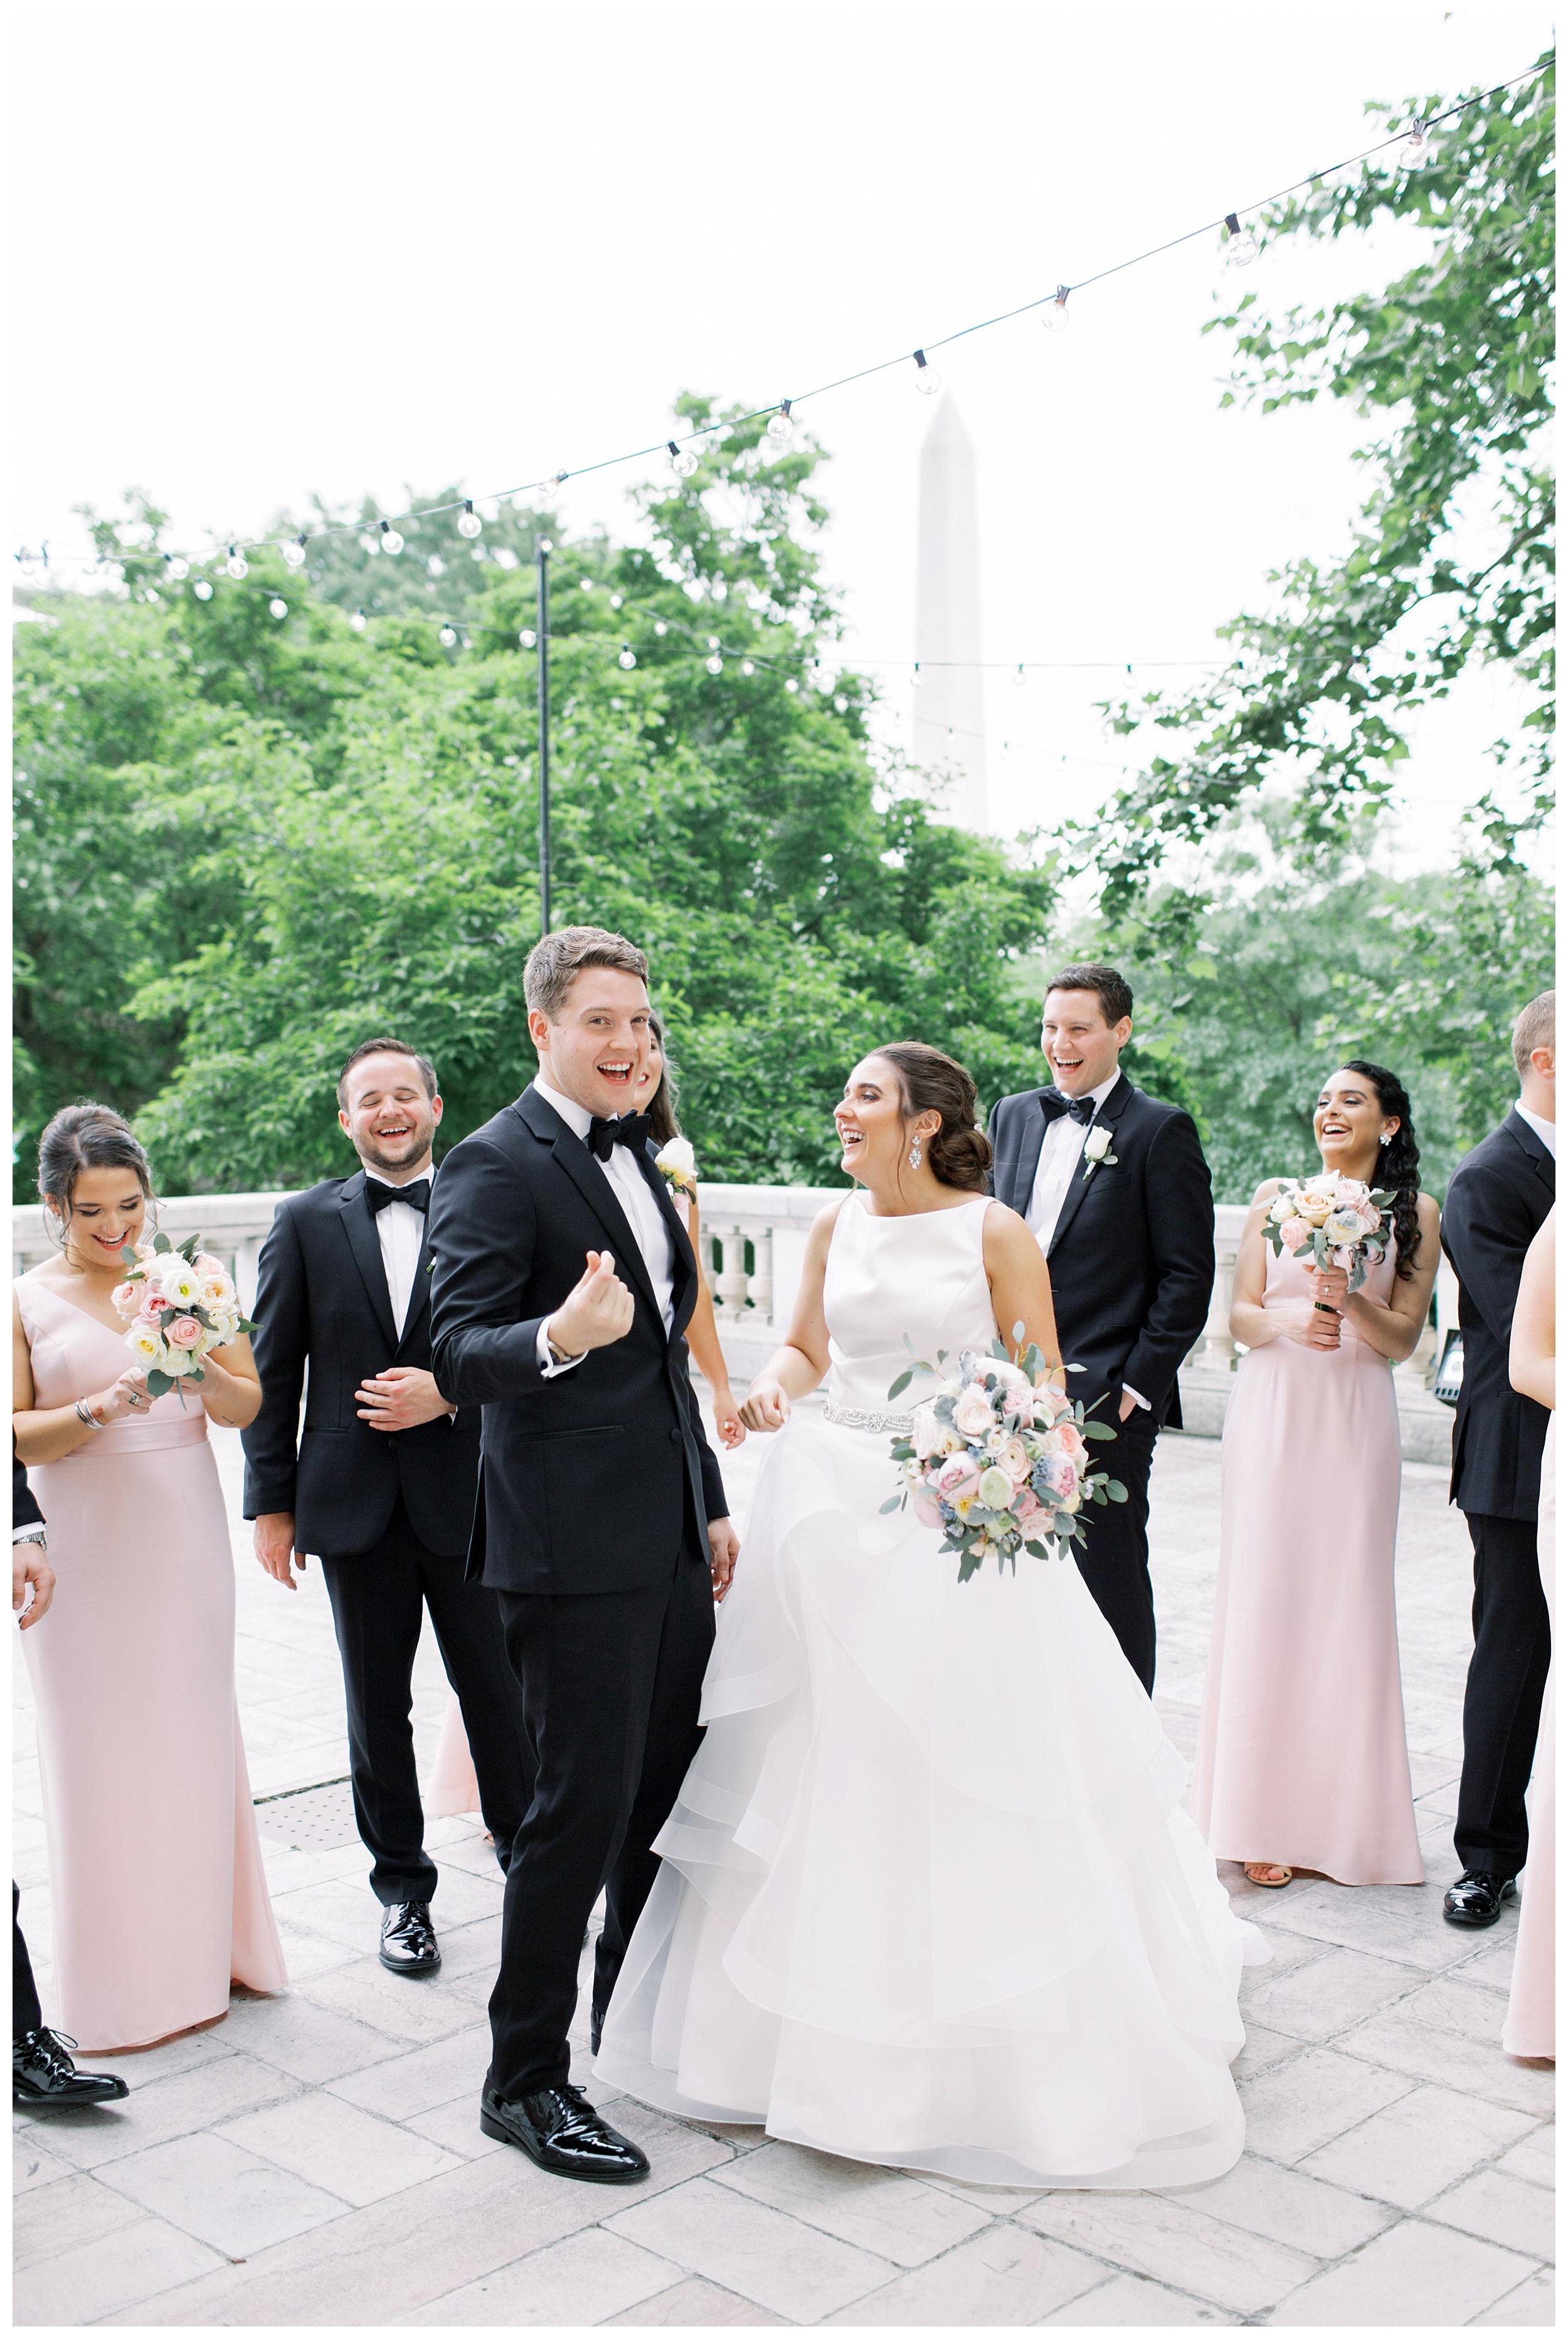 DAR Constitution Hall Wedding Wedding | Daughters of the American Revolution Wedding | District of Columbia Film Wedding Photographer Kir Tuben_0077.jpg